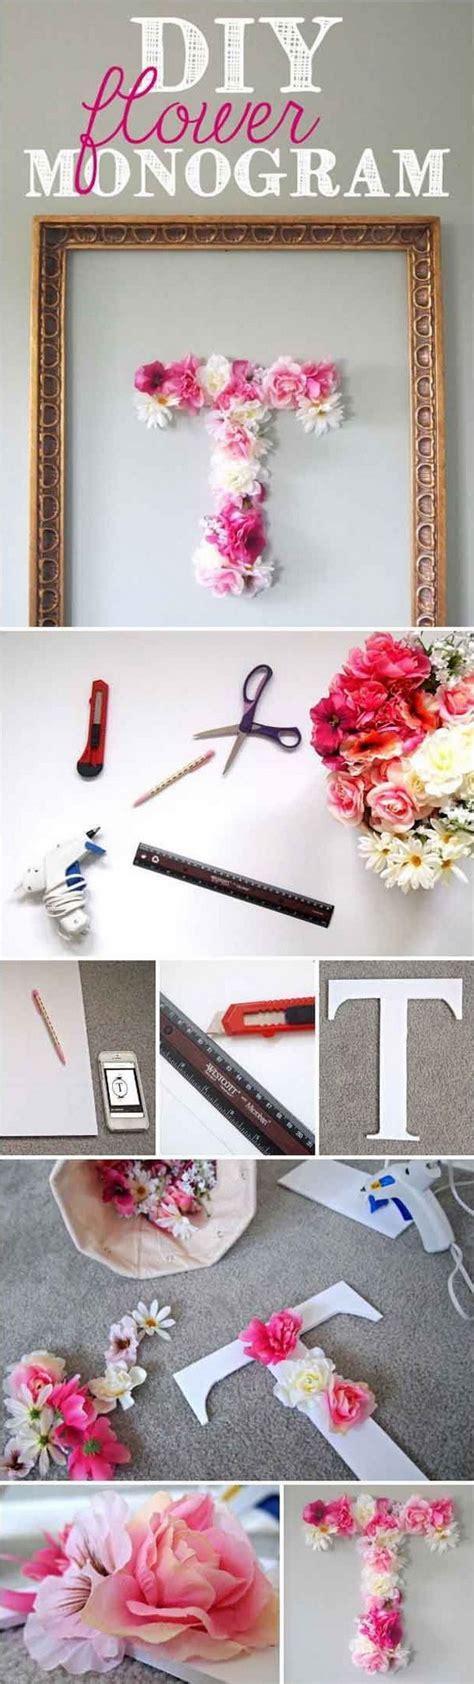 diy bedroom art ideas 25 diy ideas tutorials for teenage girl s room